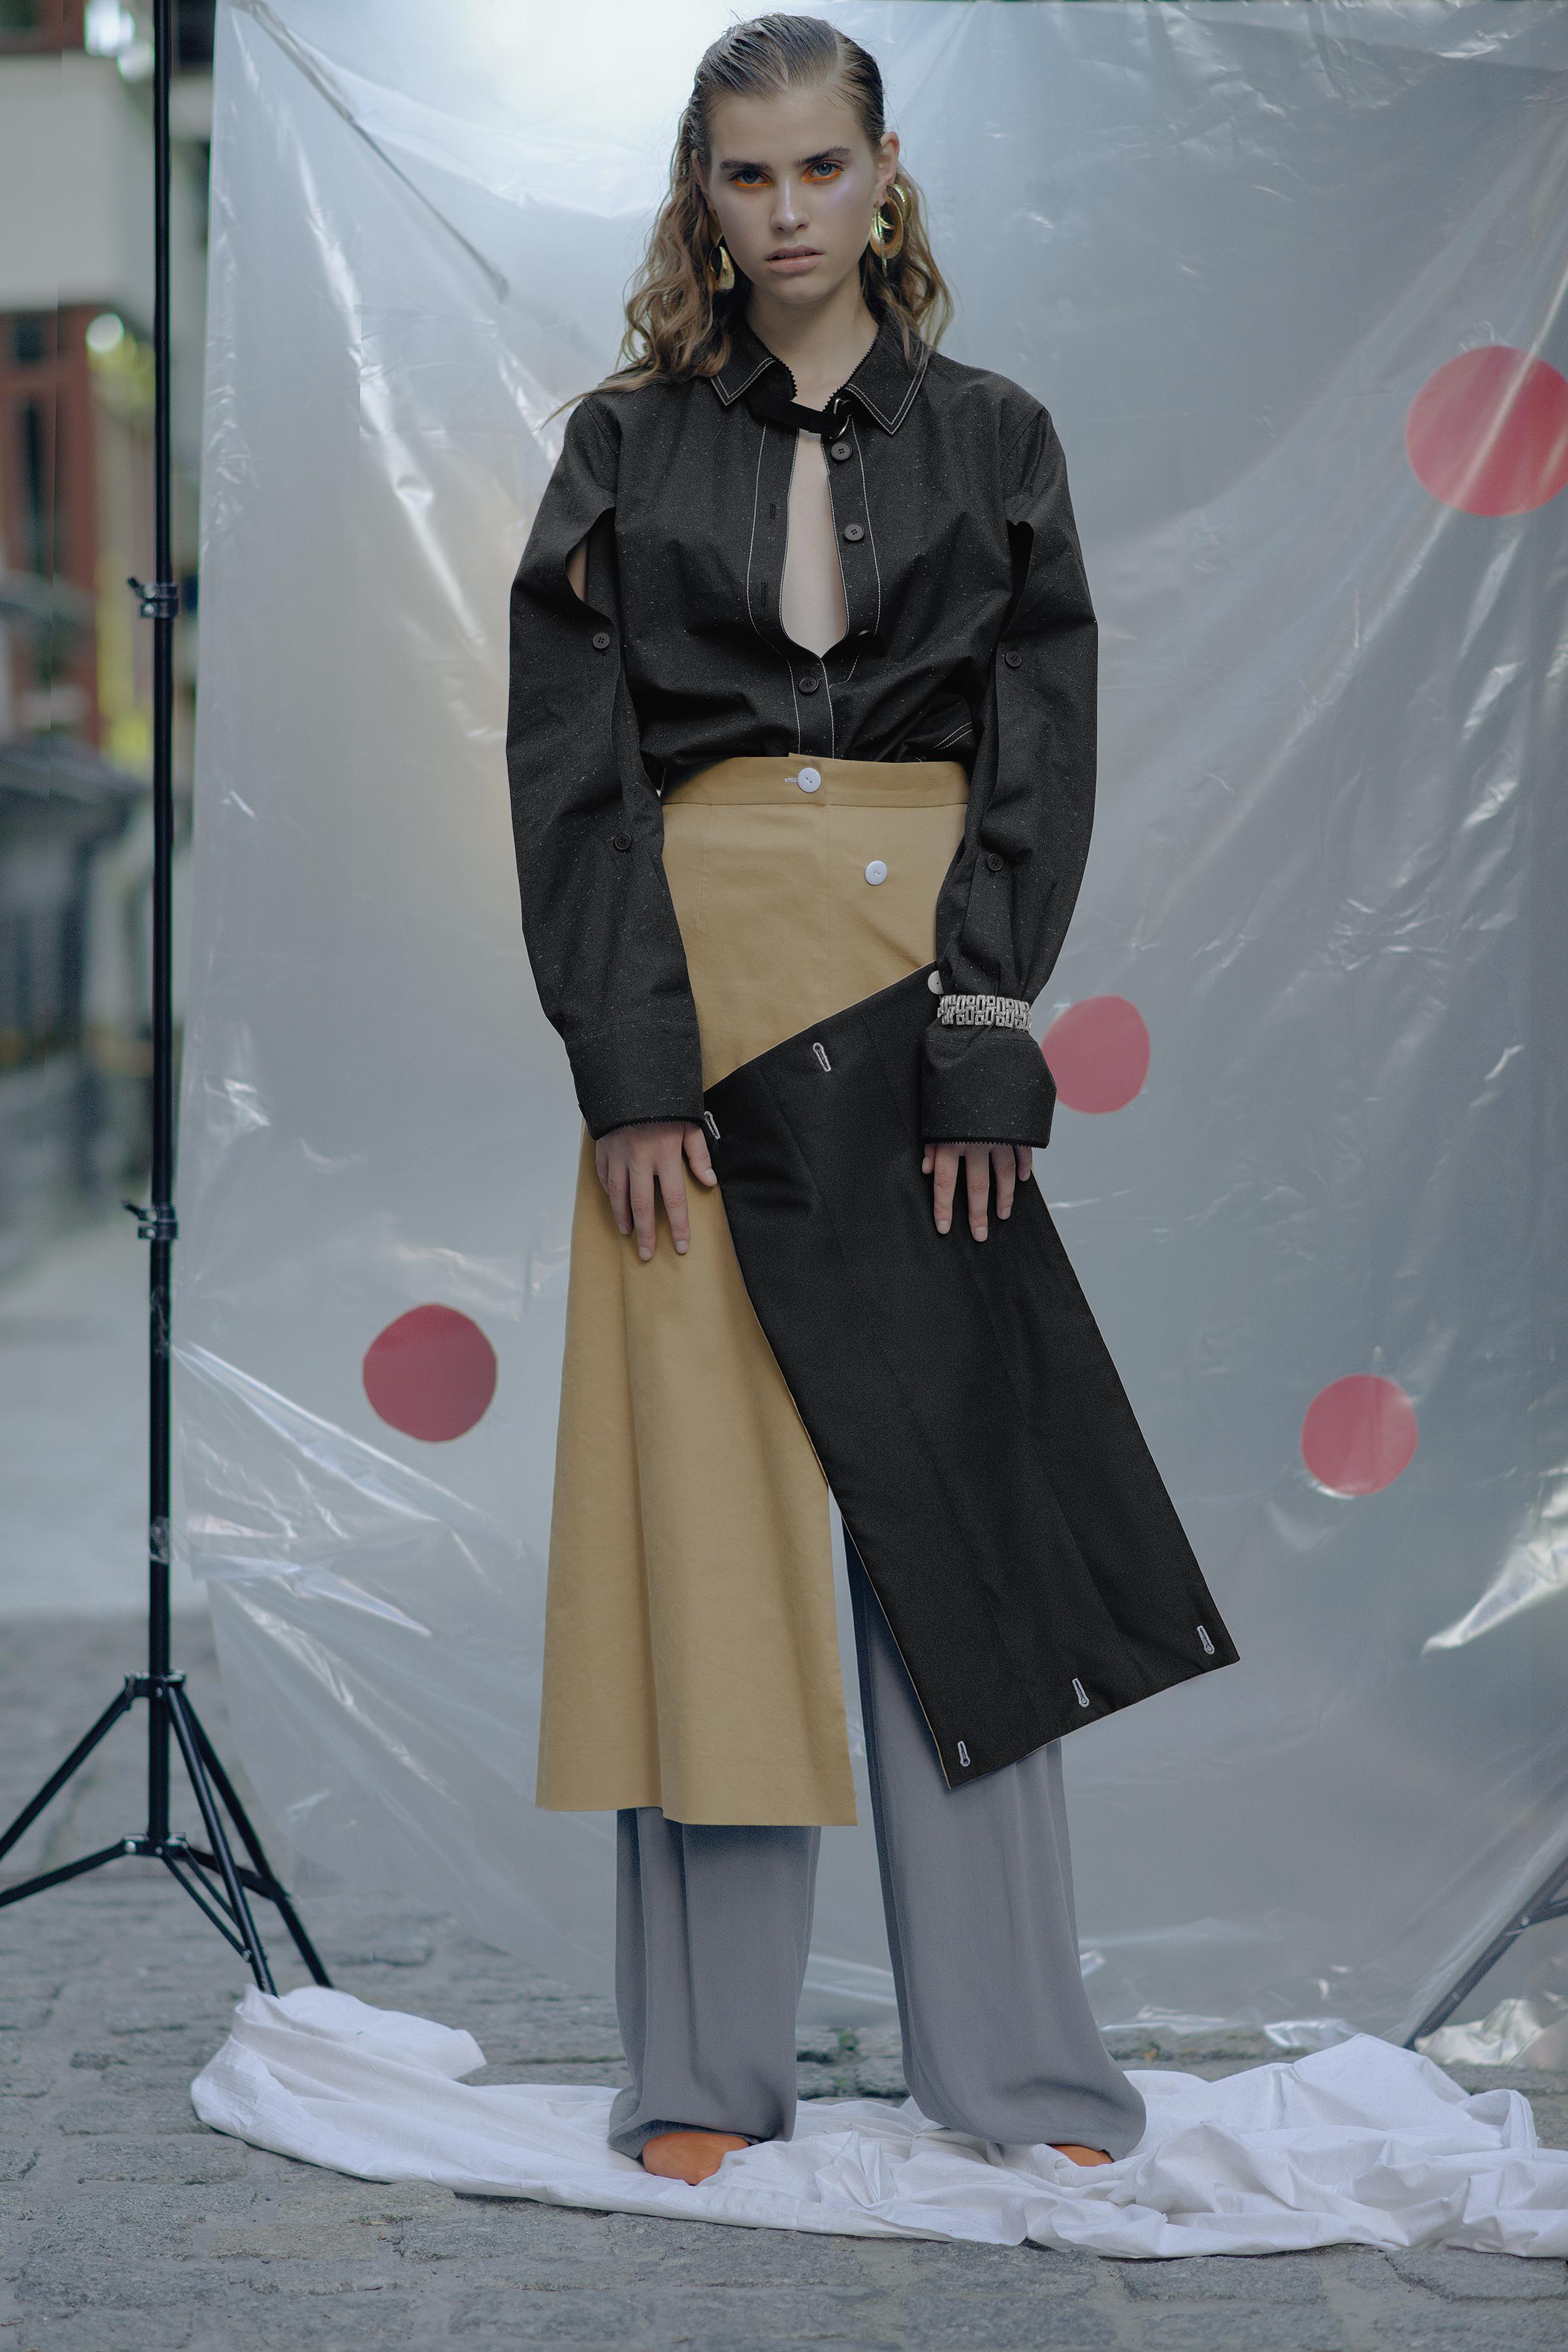 Parka PRZHONSKAYA Skirt CHAKSHYN  Pants WHATEVER  Bracelet Stylist's own Earrings Stylist's own Shoes PRZHONSKAYA & ALI SAULIDI